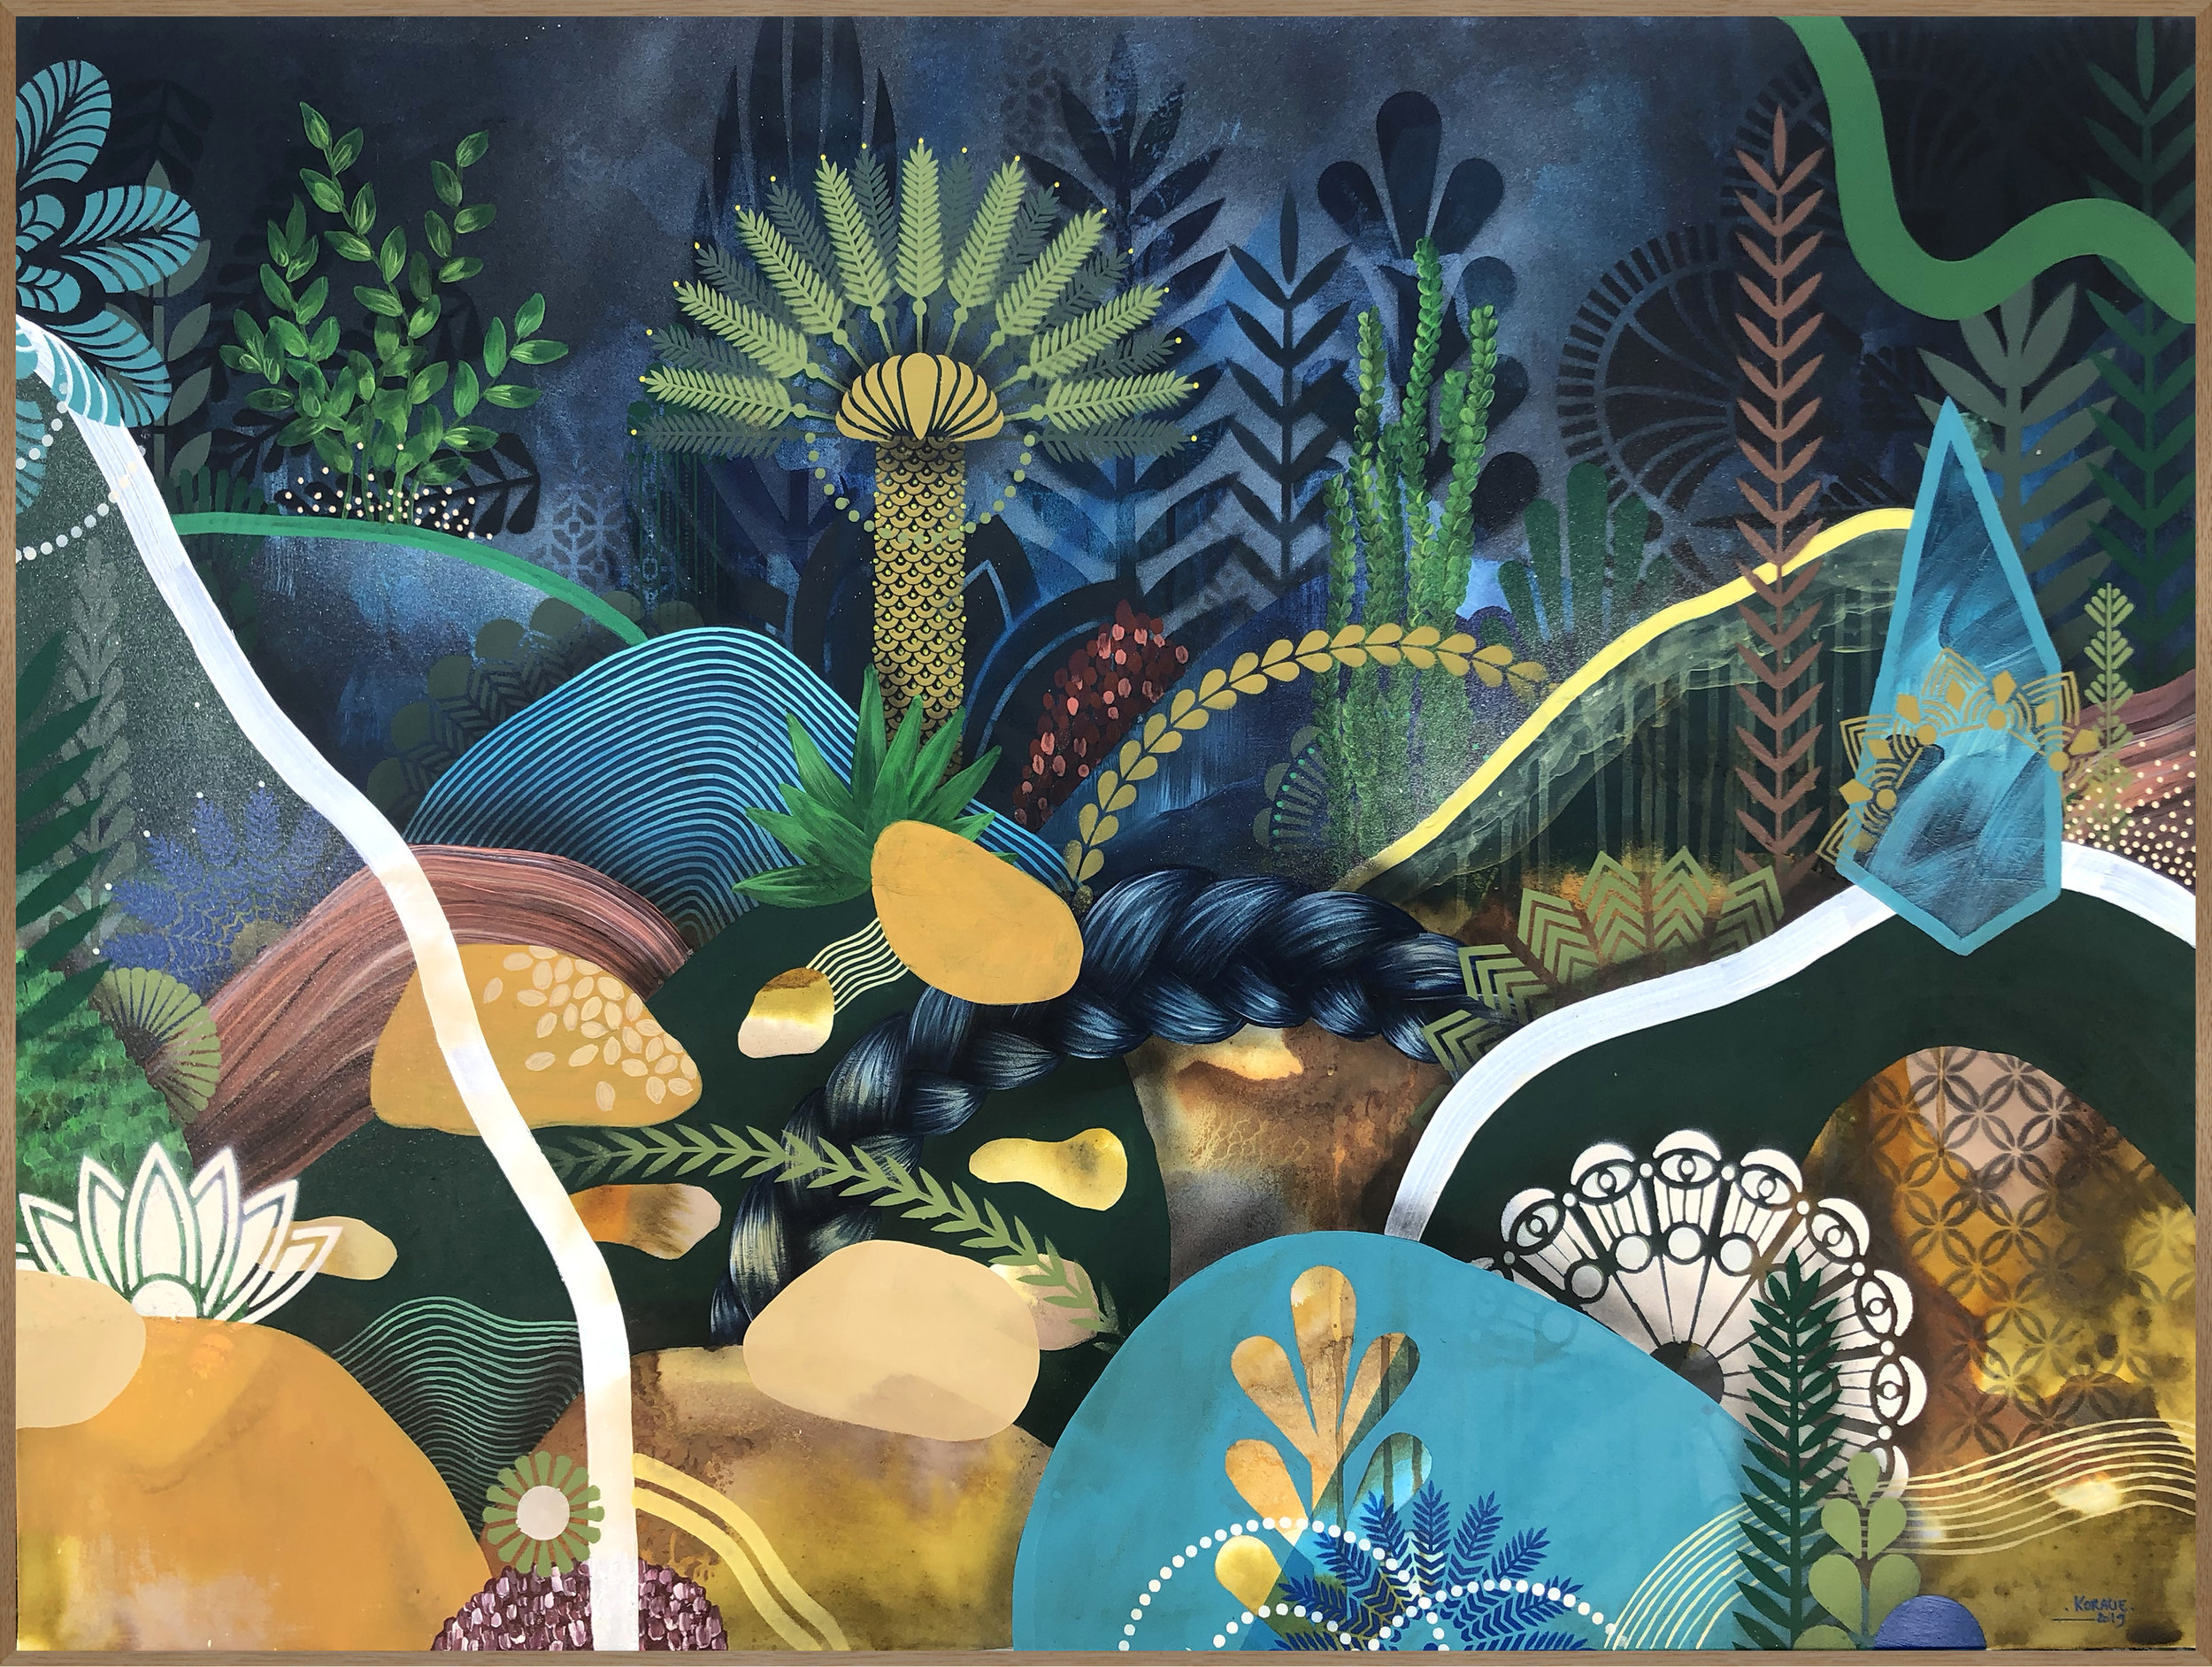 Acclimatation II  - Acrylic, oil and ink on canvas, 100 x 73 cm | 2019